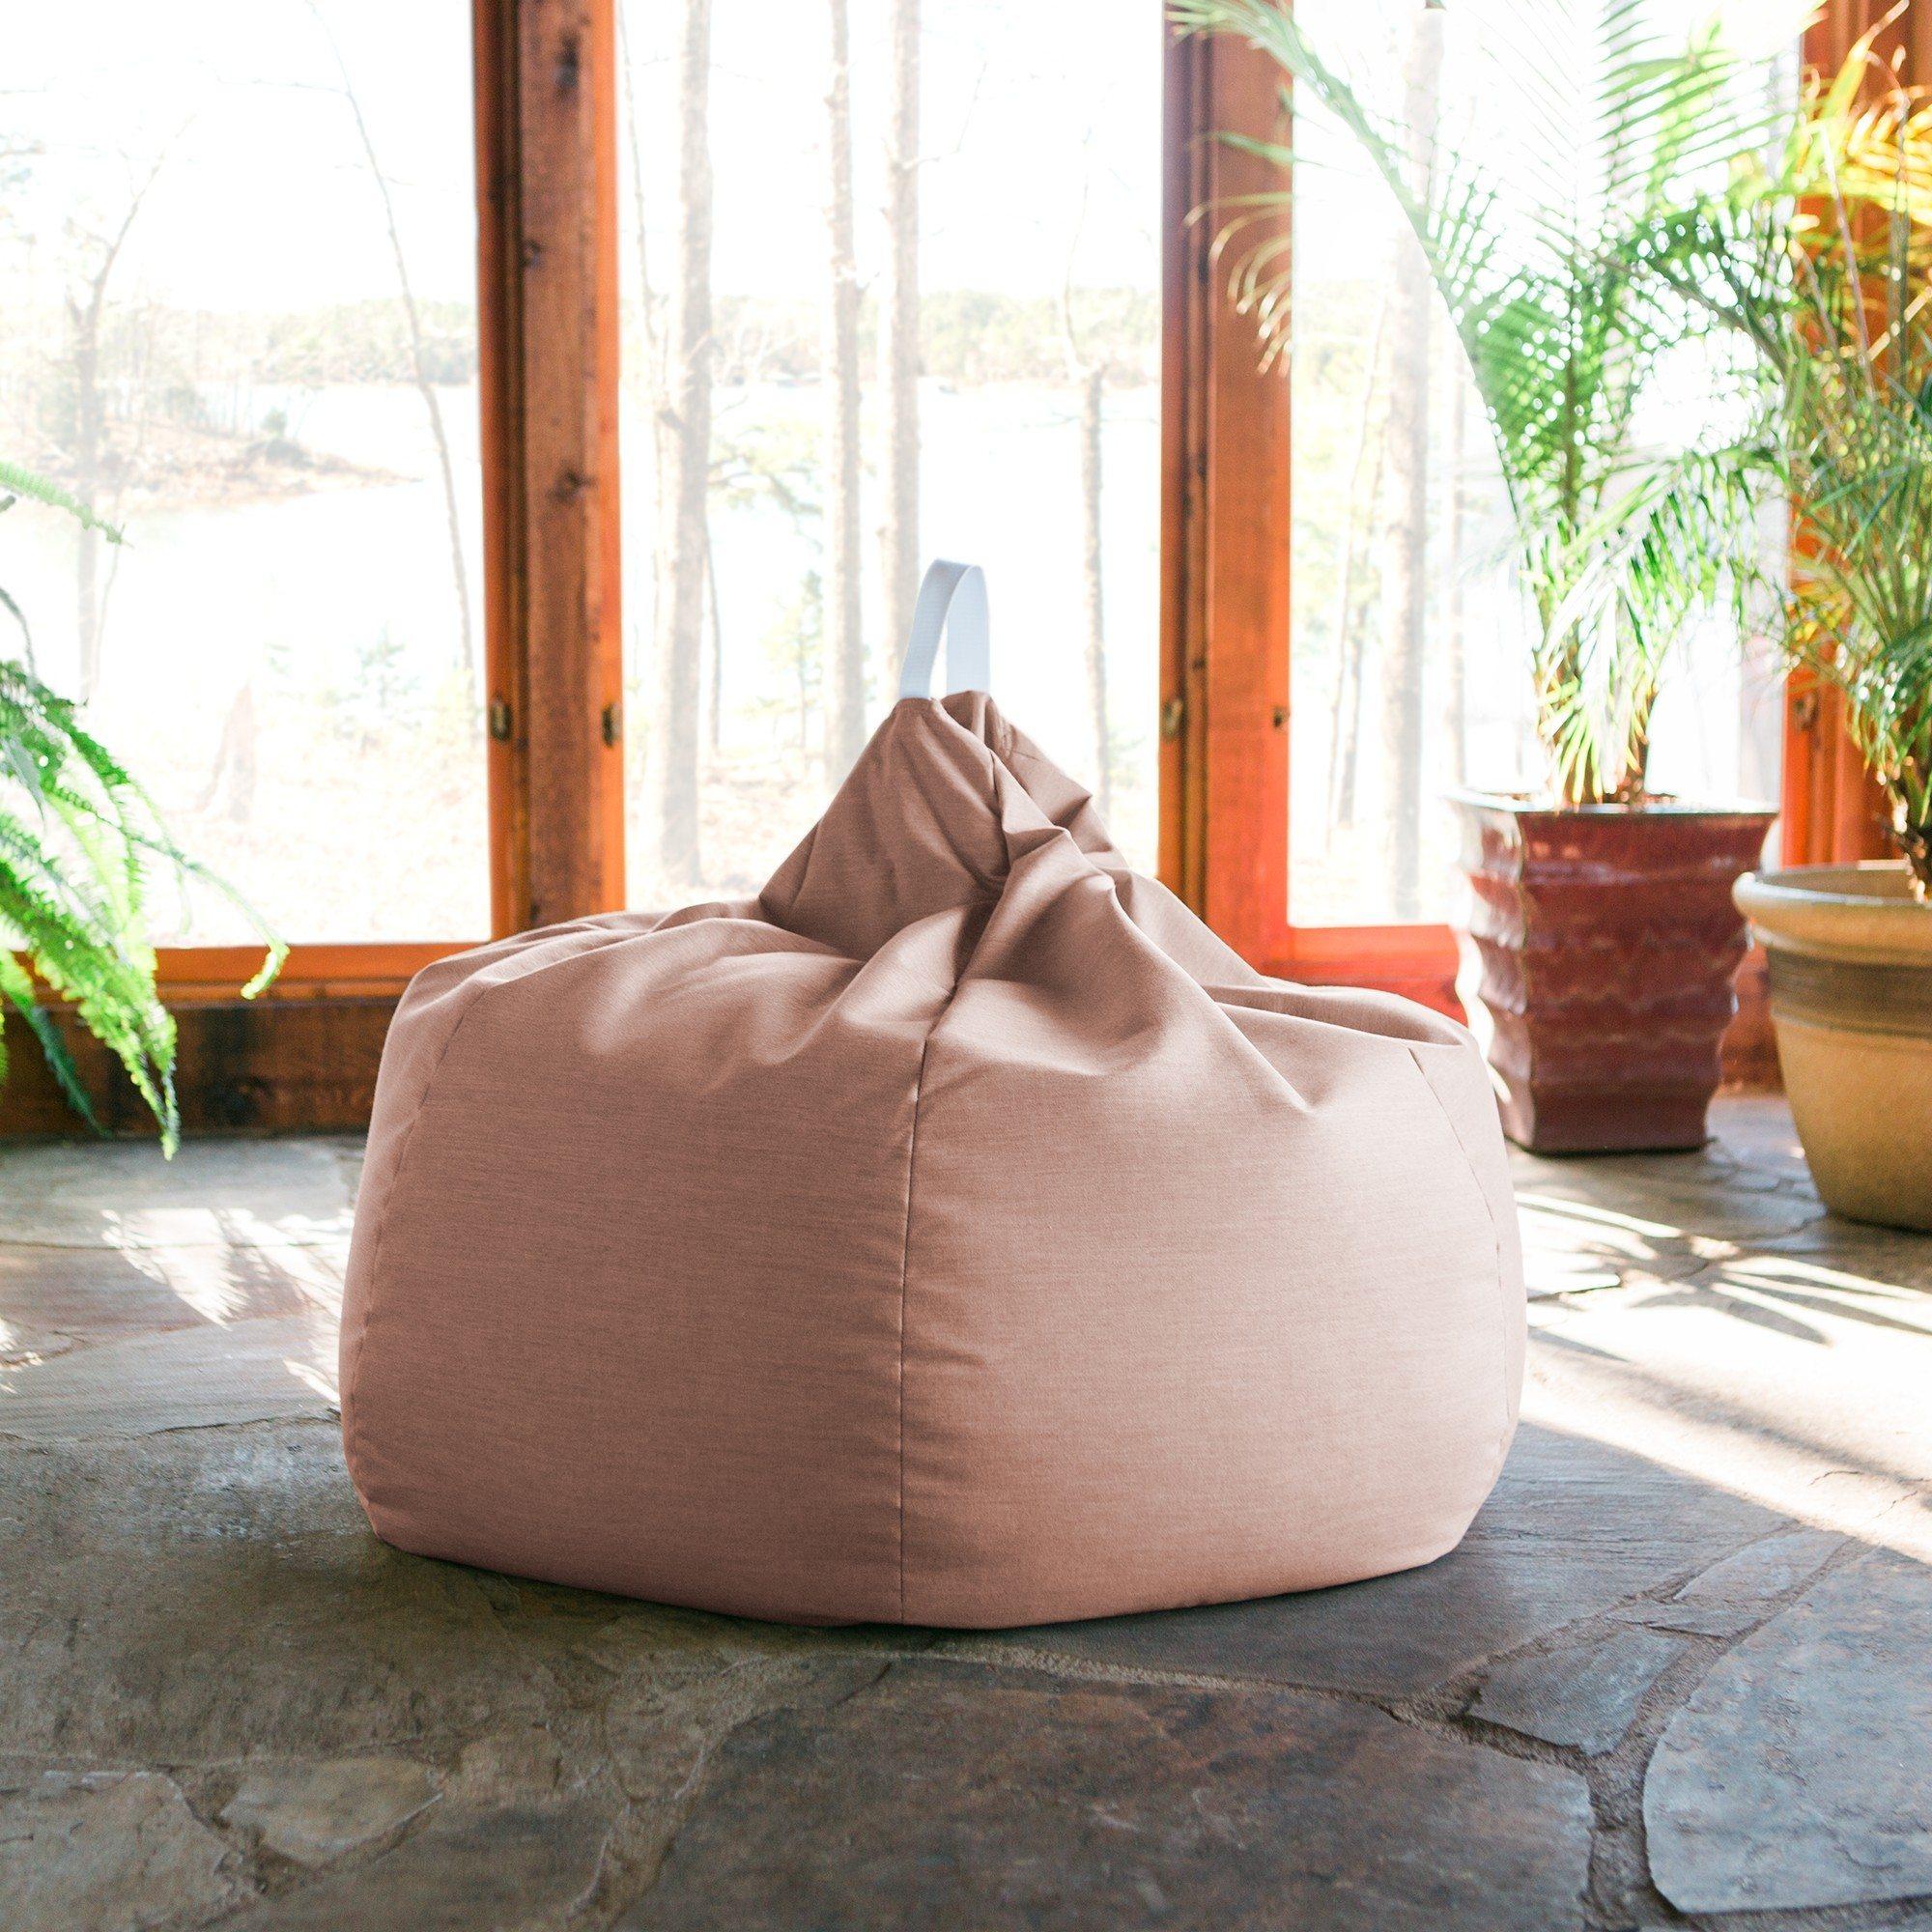 Marvelous Kiss Outdoor Patio Bean Bag Chair Petal Machost Co Dining Chair Design Ideas Machostcouk